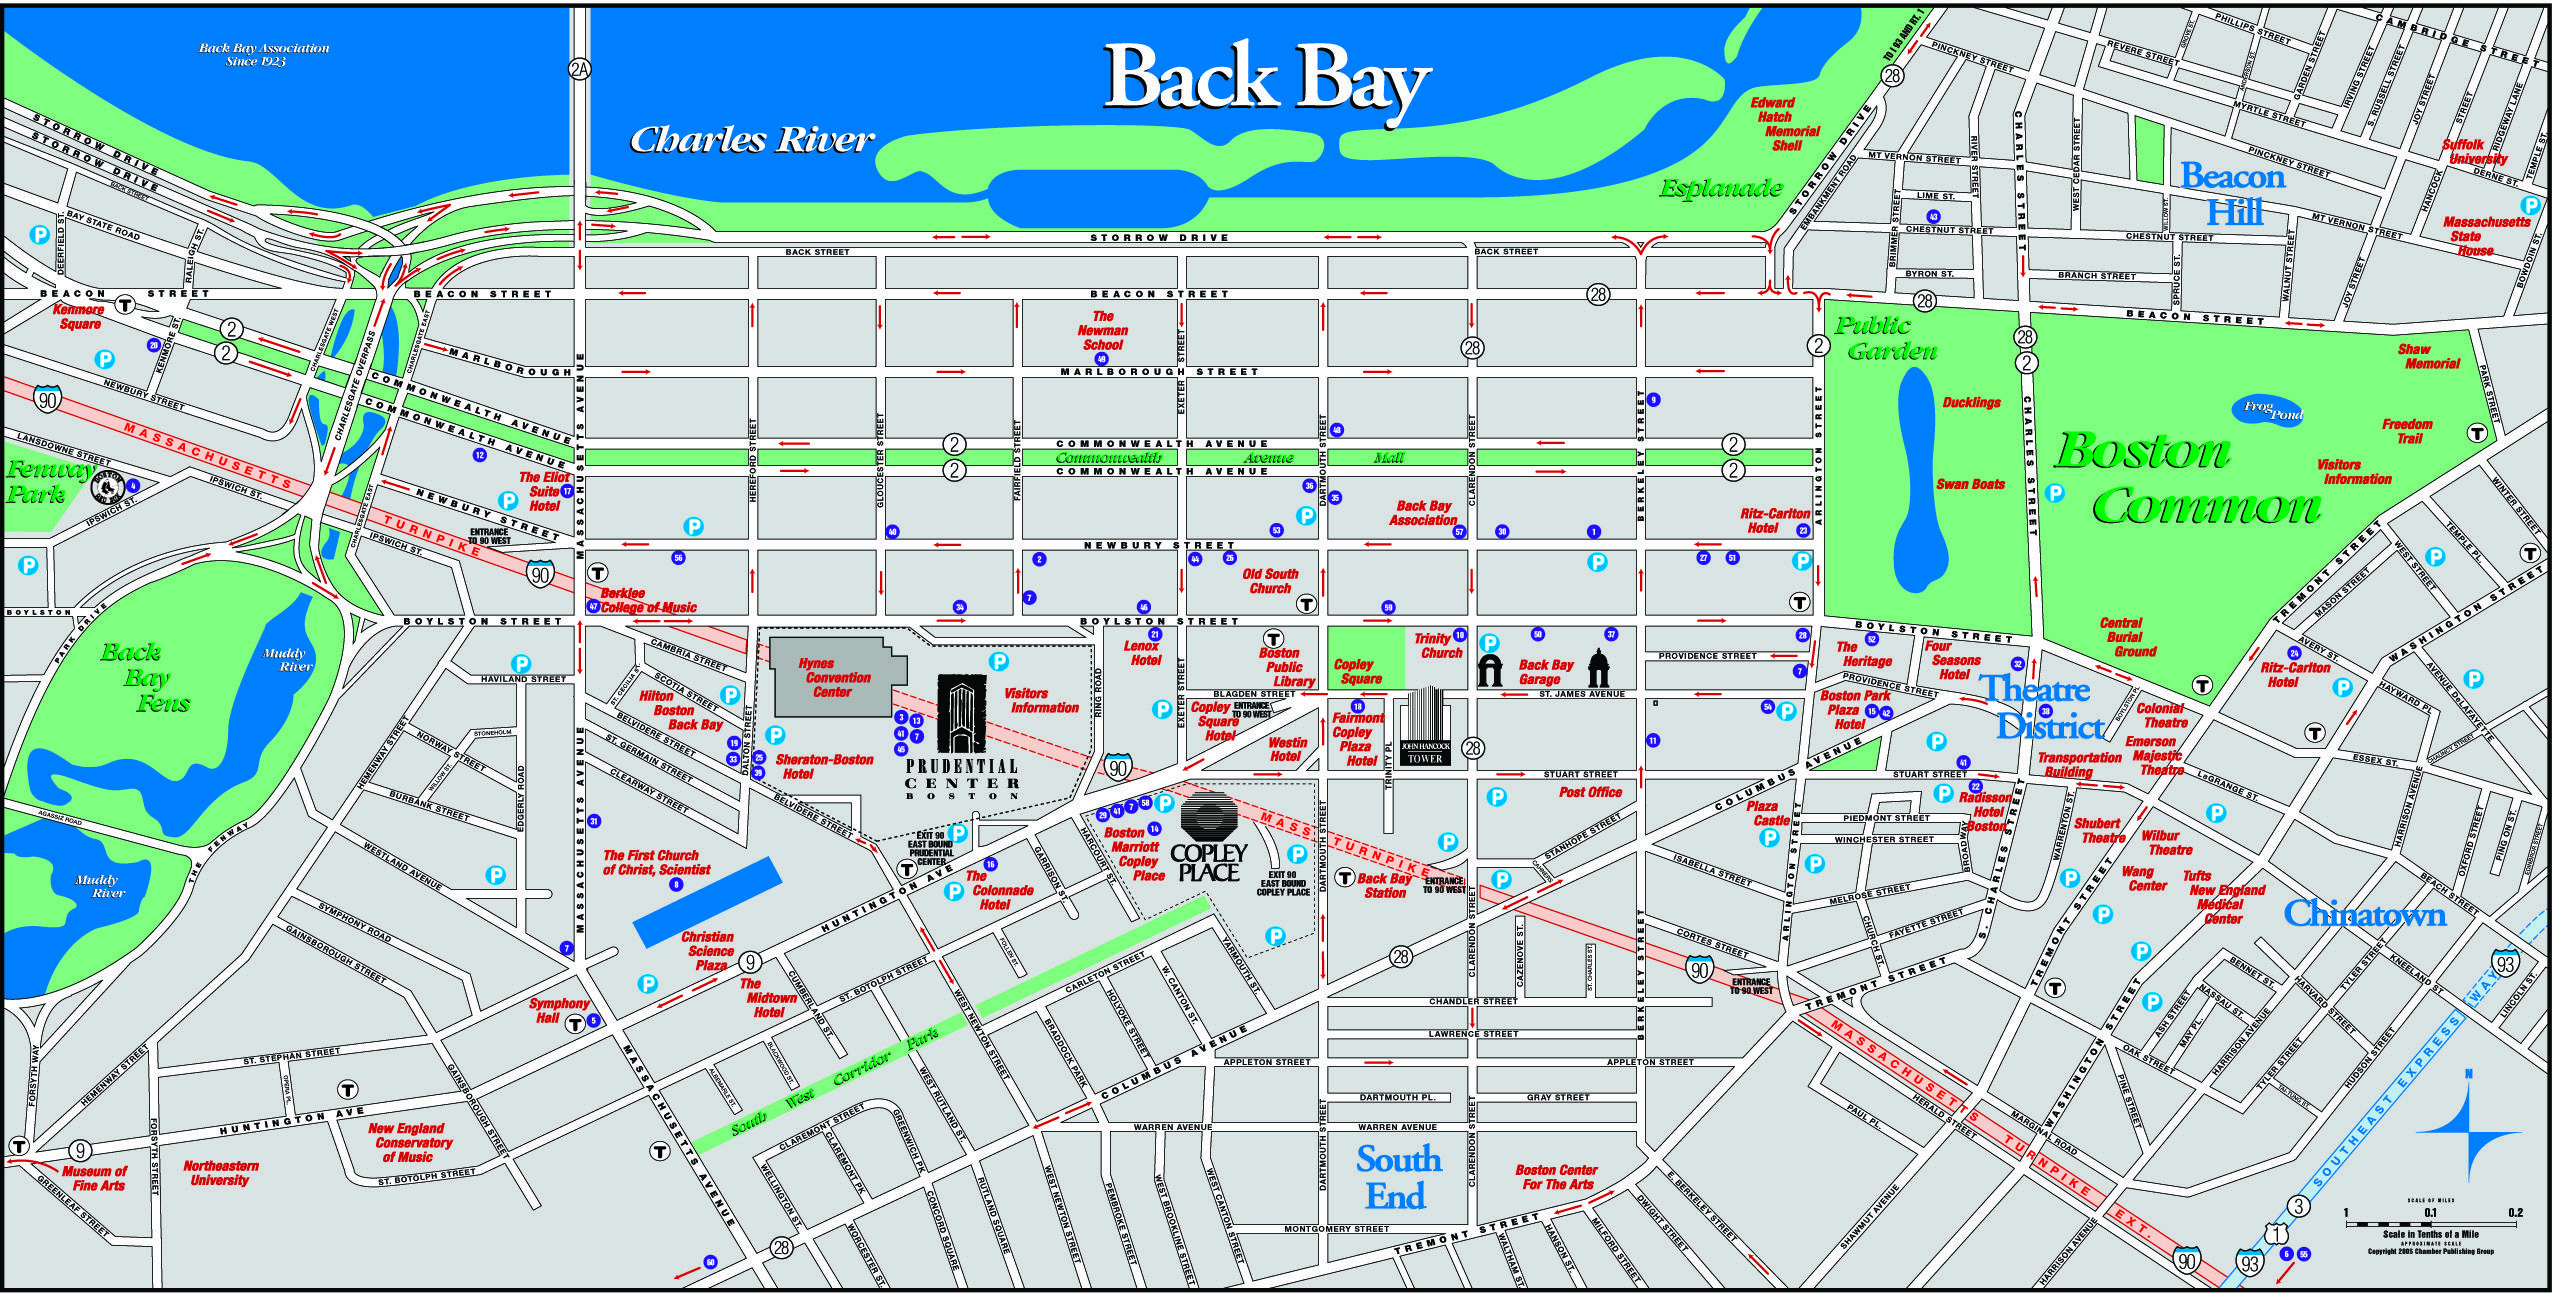 Back Bay Boston Map Back Bay | Boston map, Back bay, Boston common